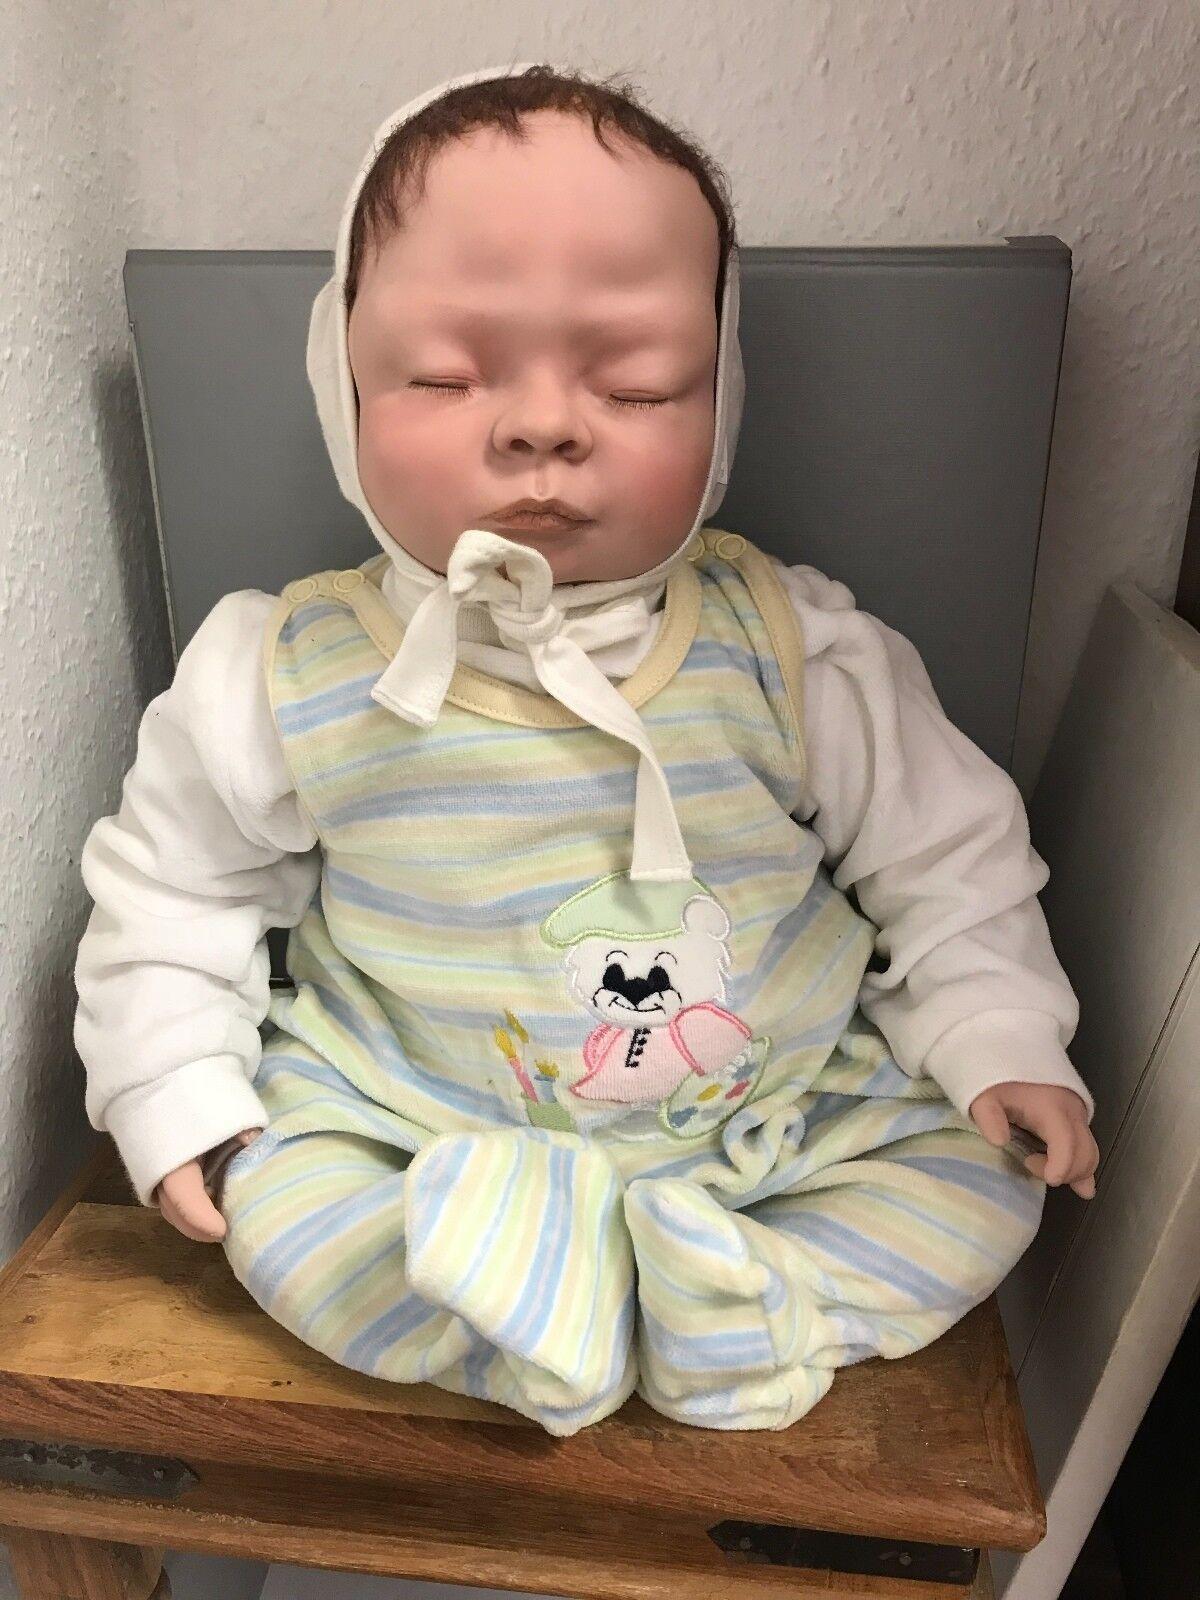 Petra Lechner vinilo muñeca 52 cm. top estado